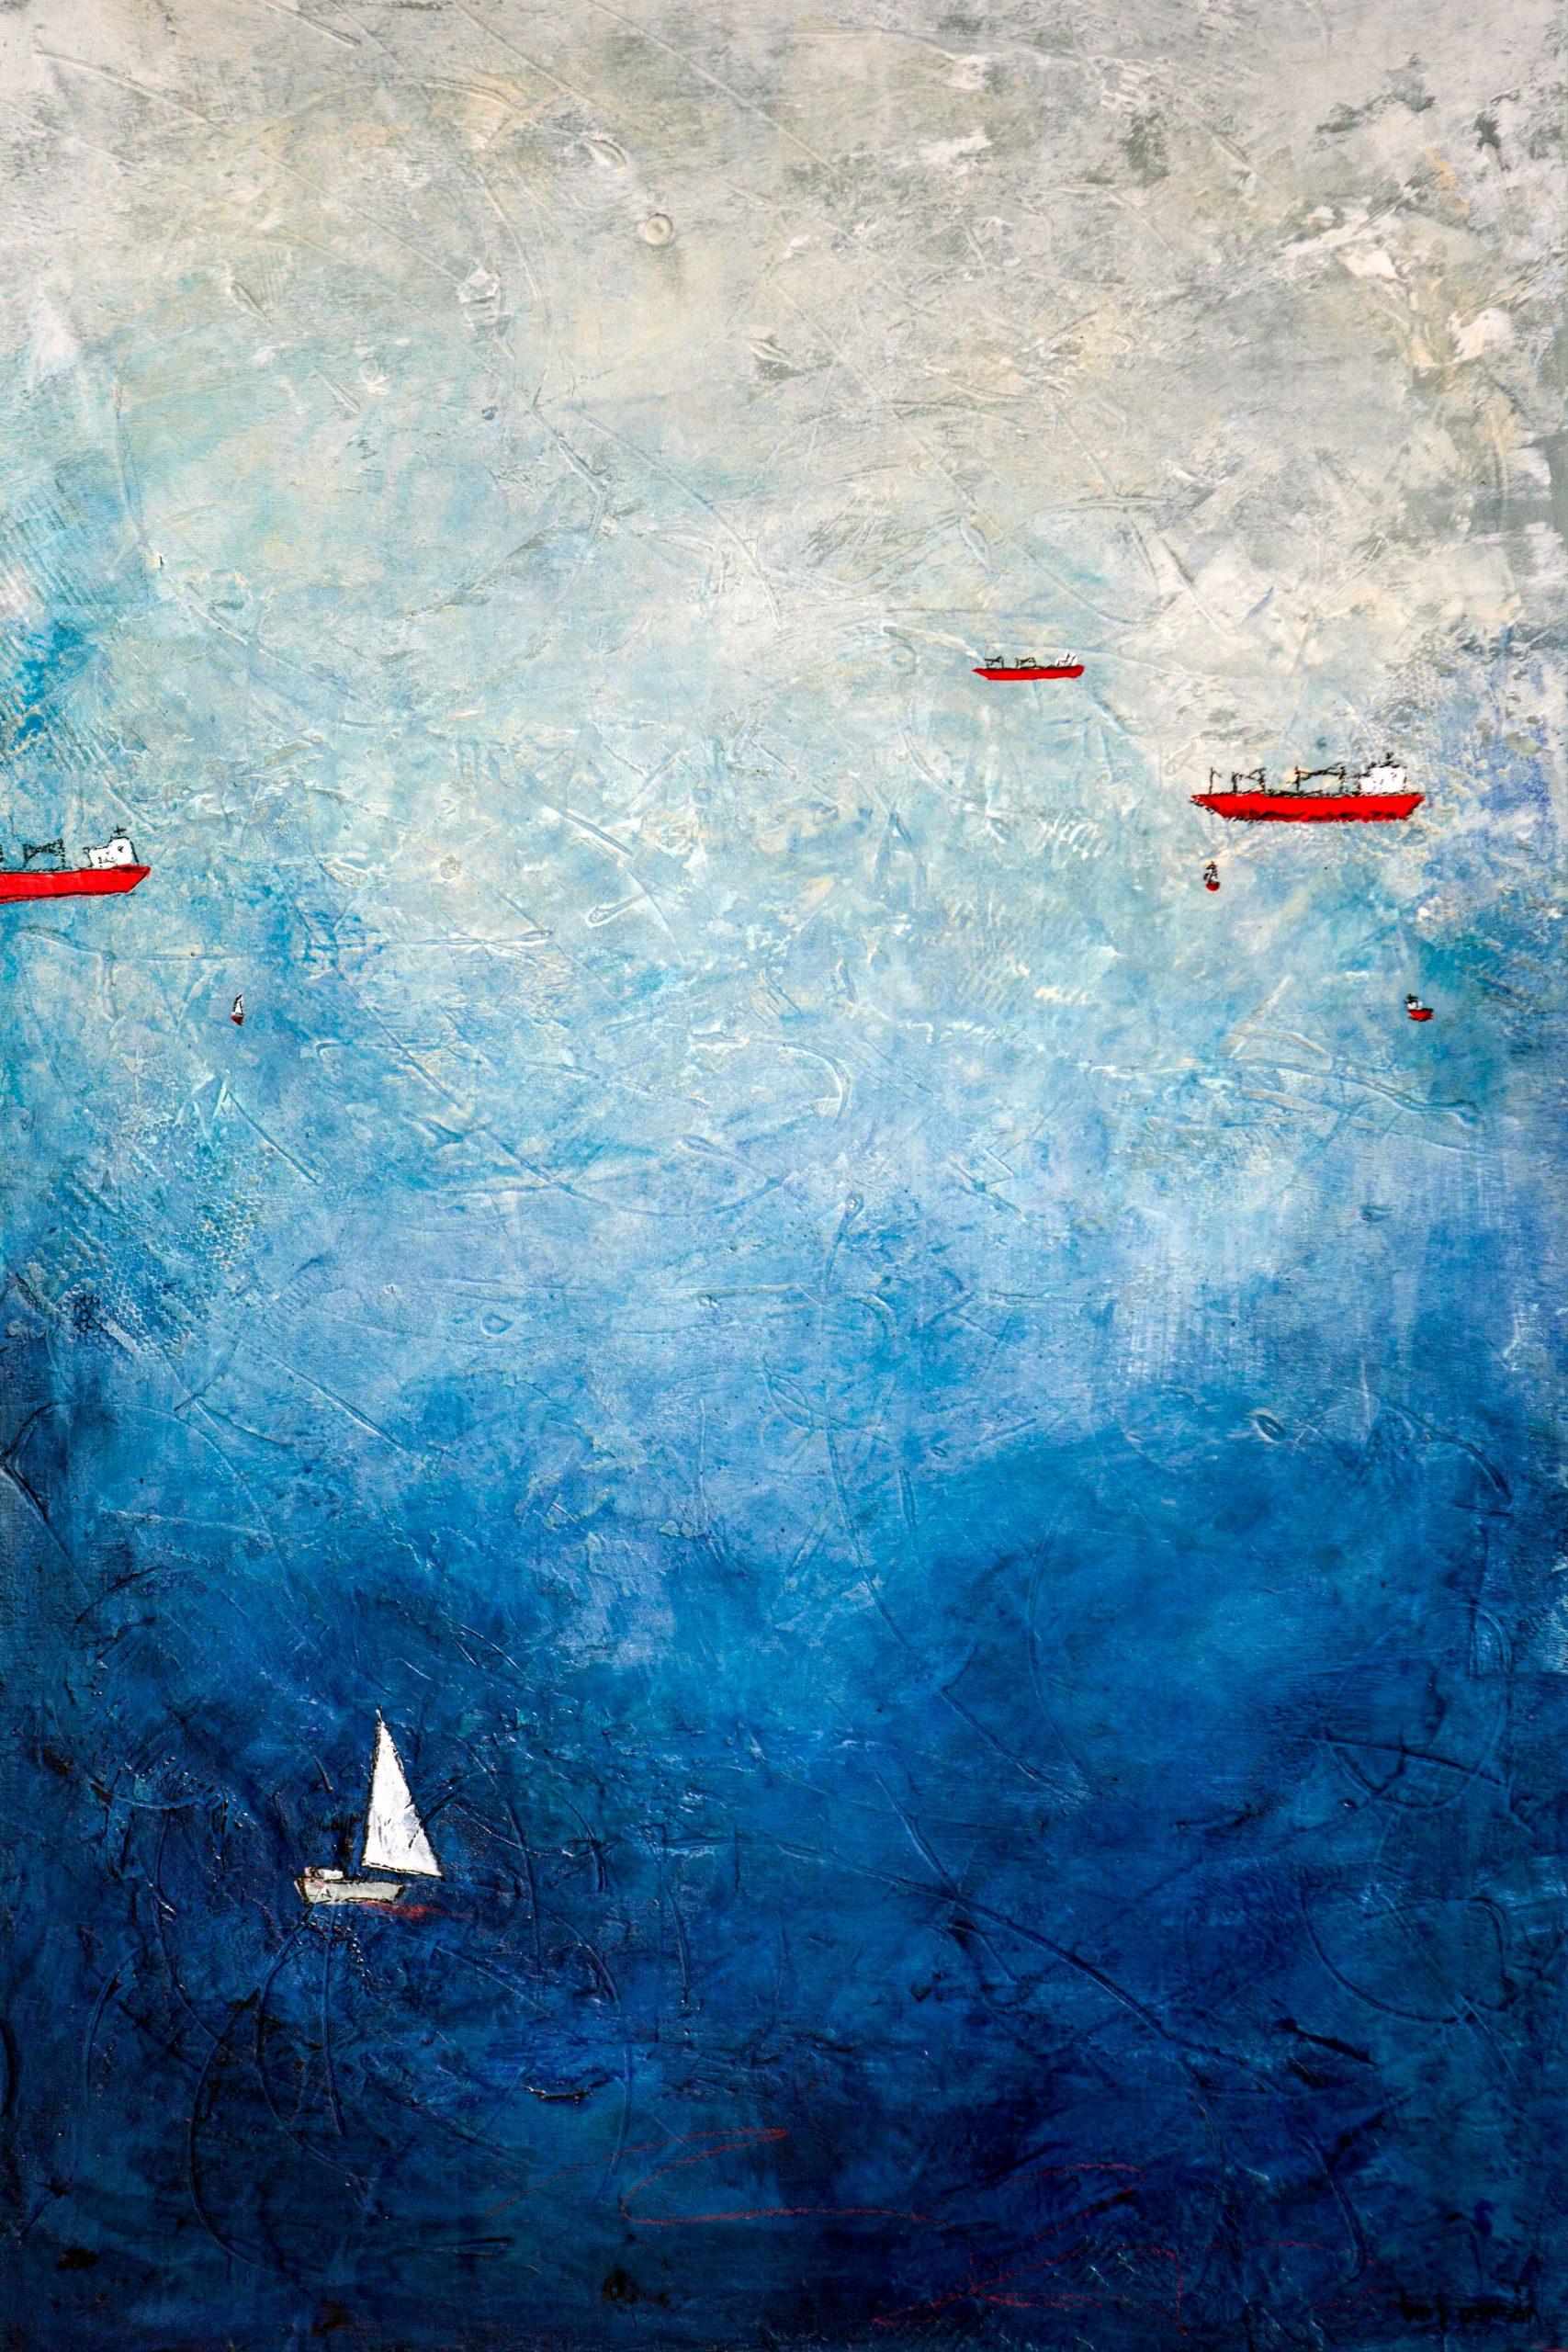 Artwork, painting, fineart